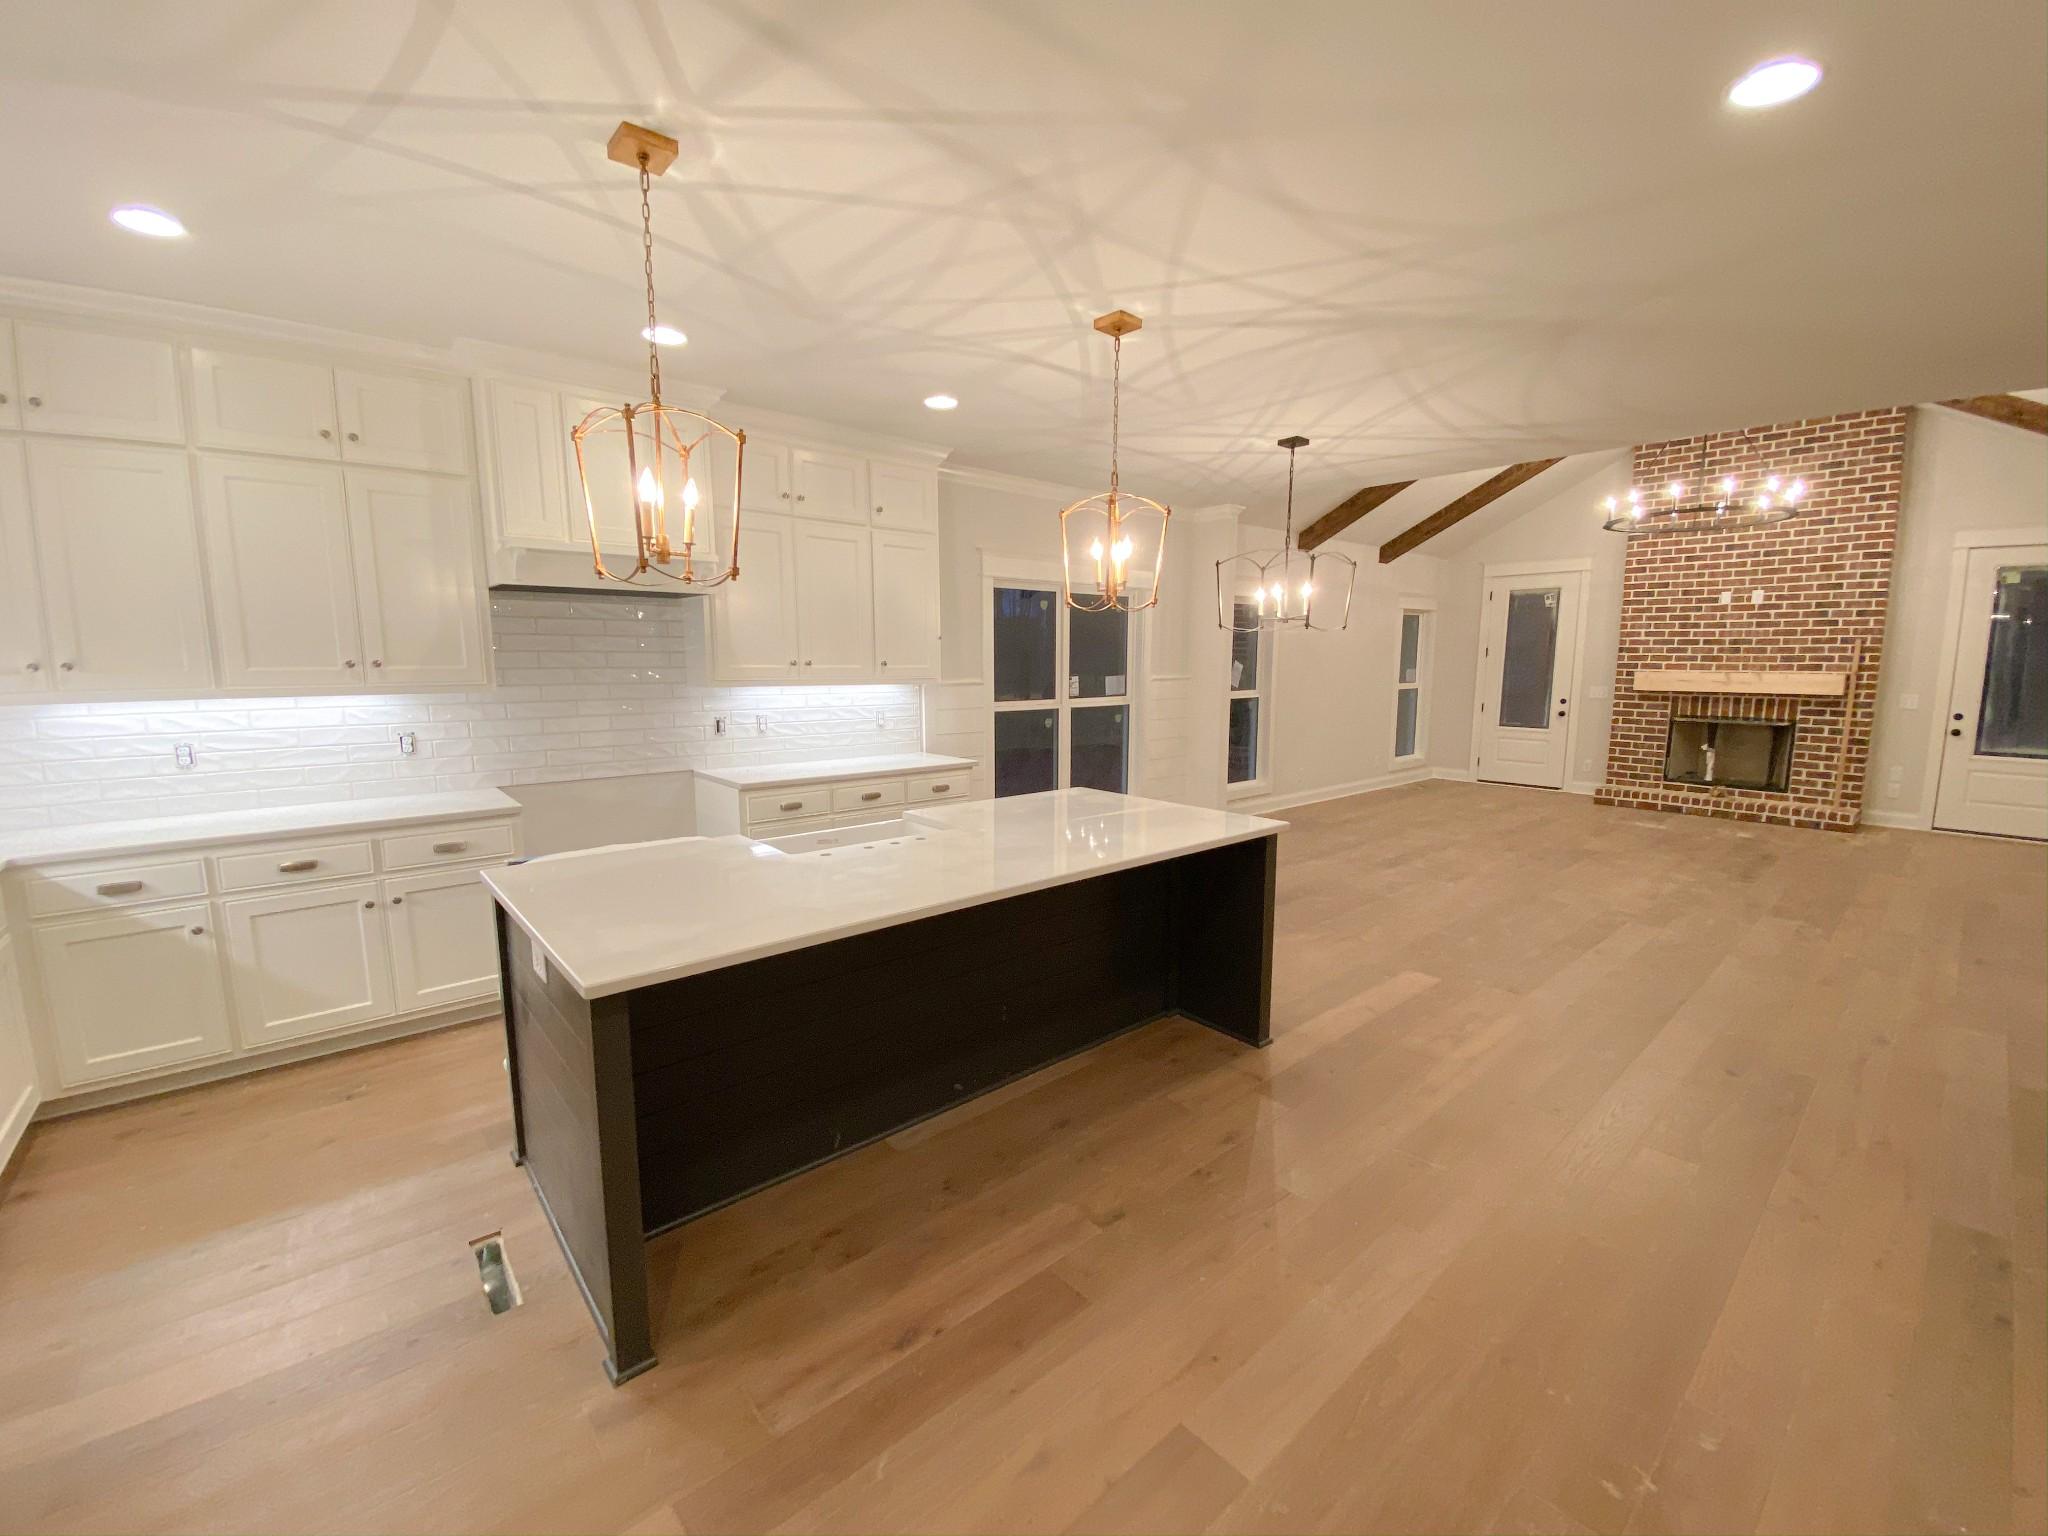 45 Saratoga Dr, Lebanon, TN 37087 - Lebanon, TN real estate listing